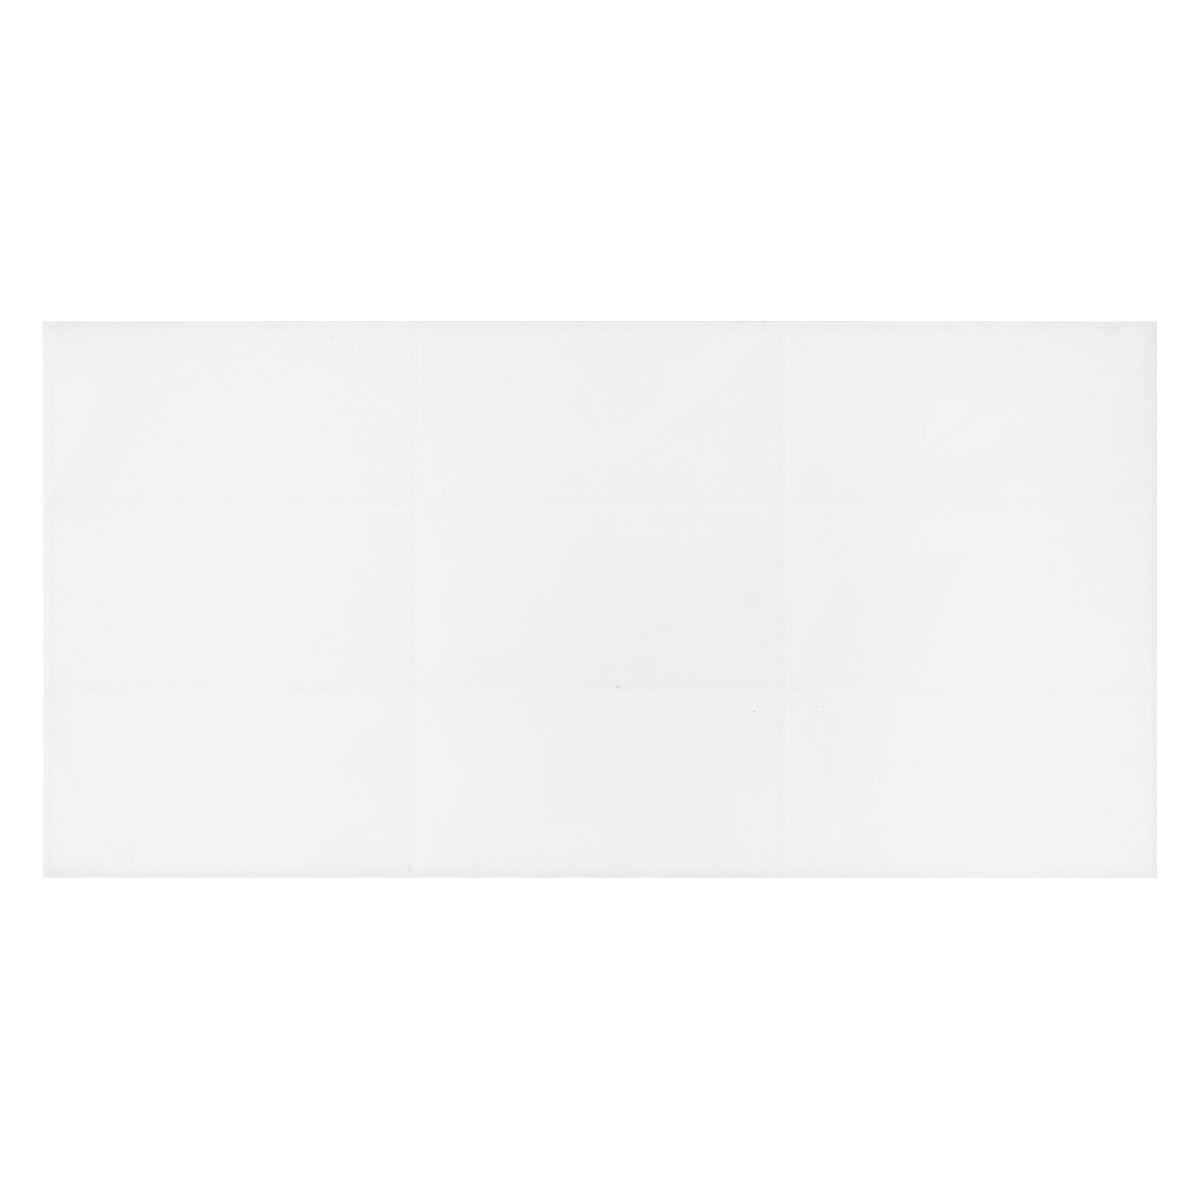 Mayólica Square Blanco Mate - 30X60 cm - 1.44 m2